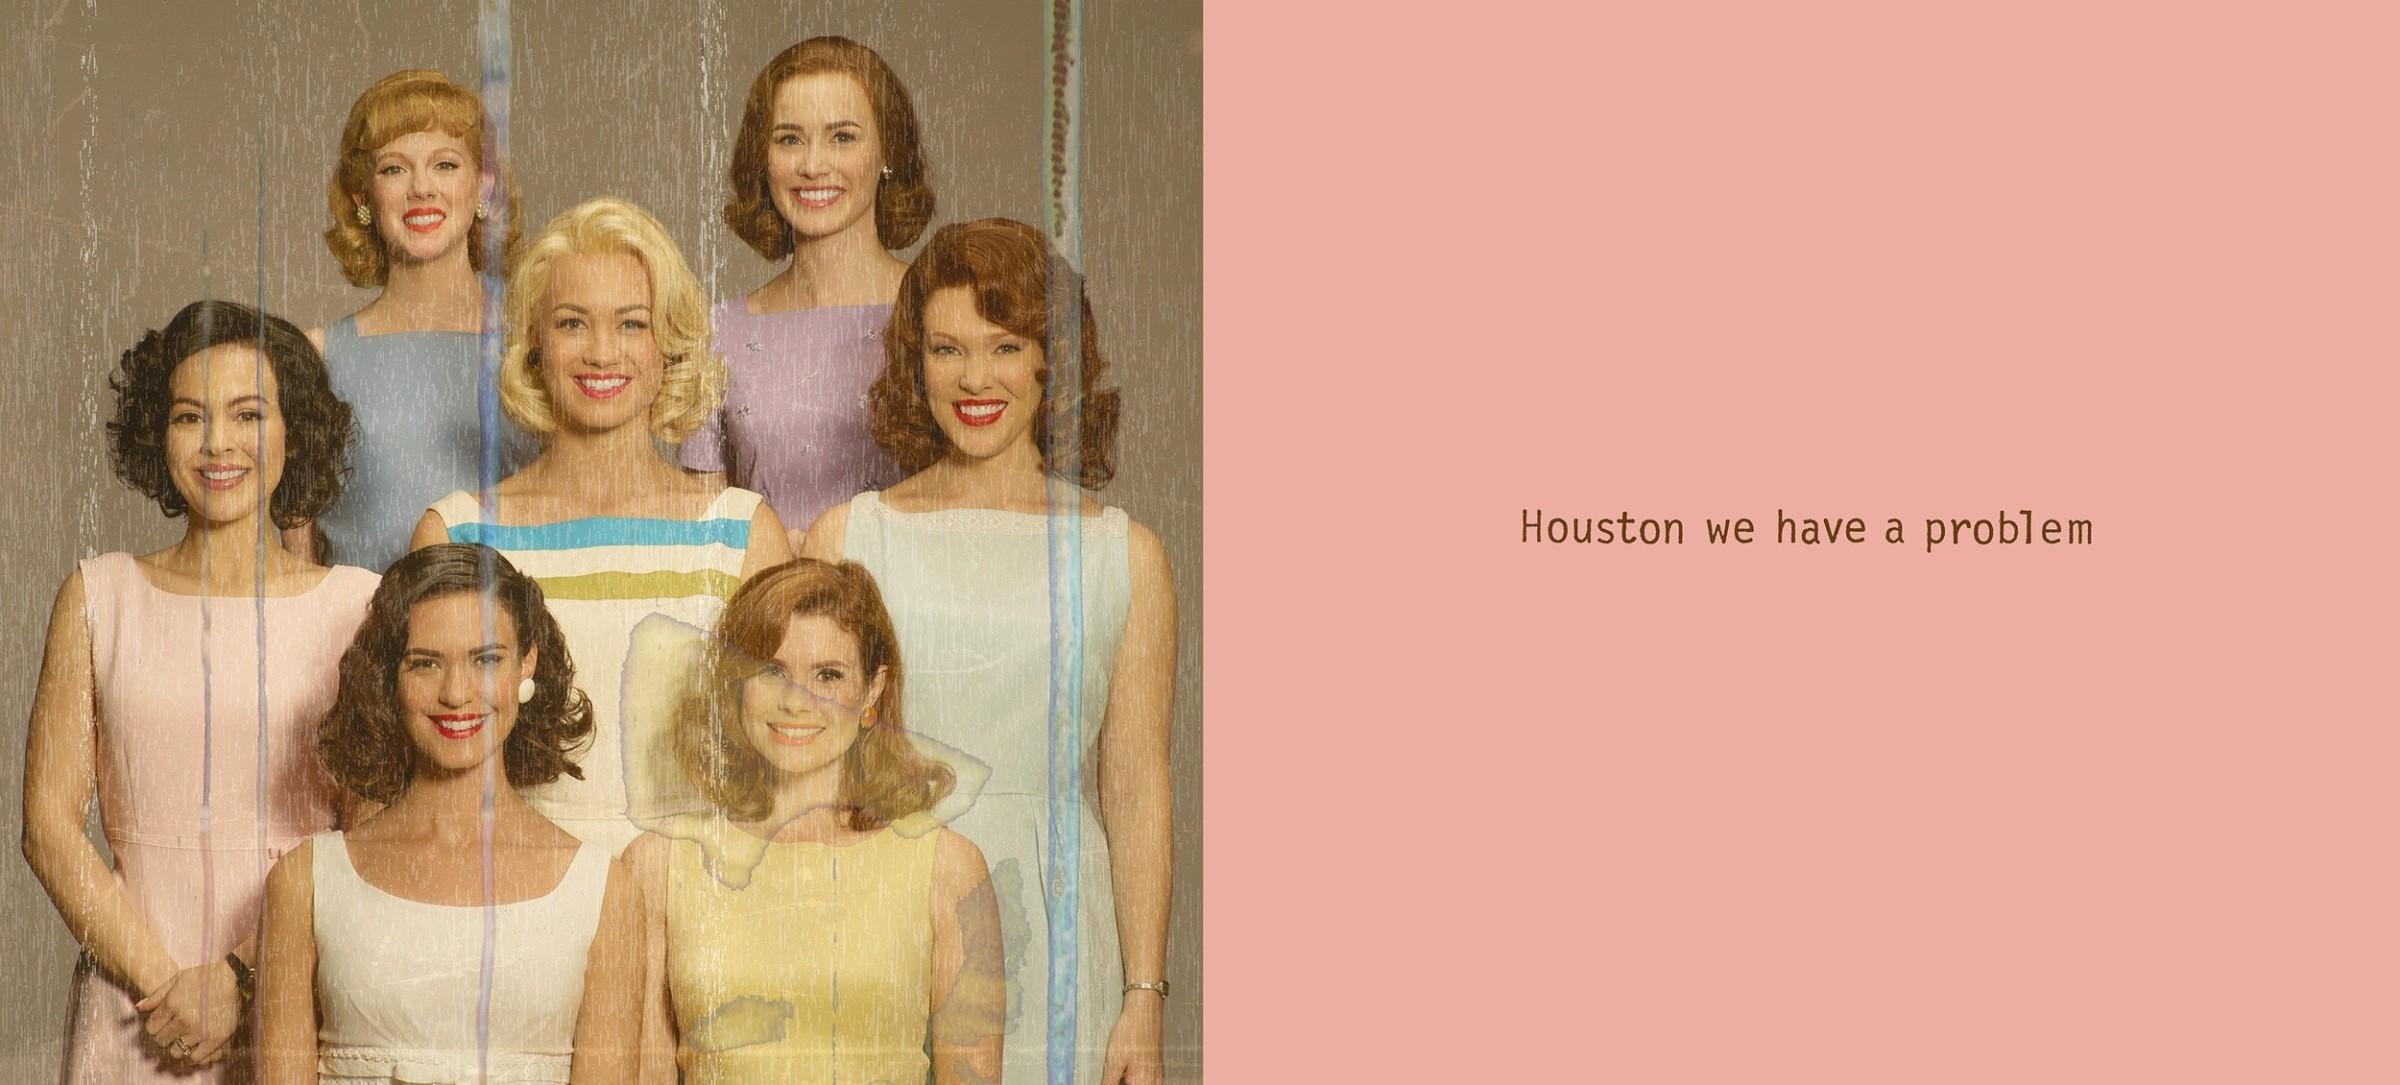 "<span class=""link fancybox-details-link""><a href=""/artists/298-gordon-ellis-brown-are/works/10646/"">View Detail Page</a></span><div class=""artist""><span class=""artist""><strong>Gordon Ellis-Brown ARE</strong></span></div><div class=""title""><em>Untitled XV - Houston We Have A Problem, Space, Final Frontier</em></div><div class=""medium"">digital print, acrylic, pigment, mixed media on wood panel</div>"